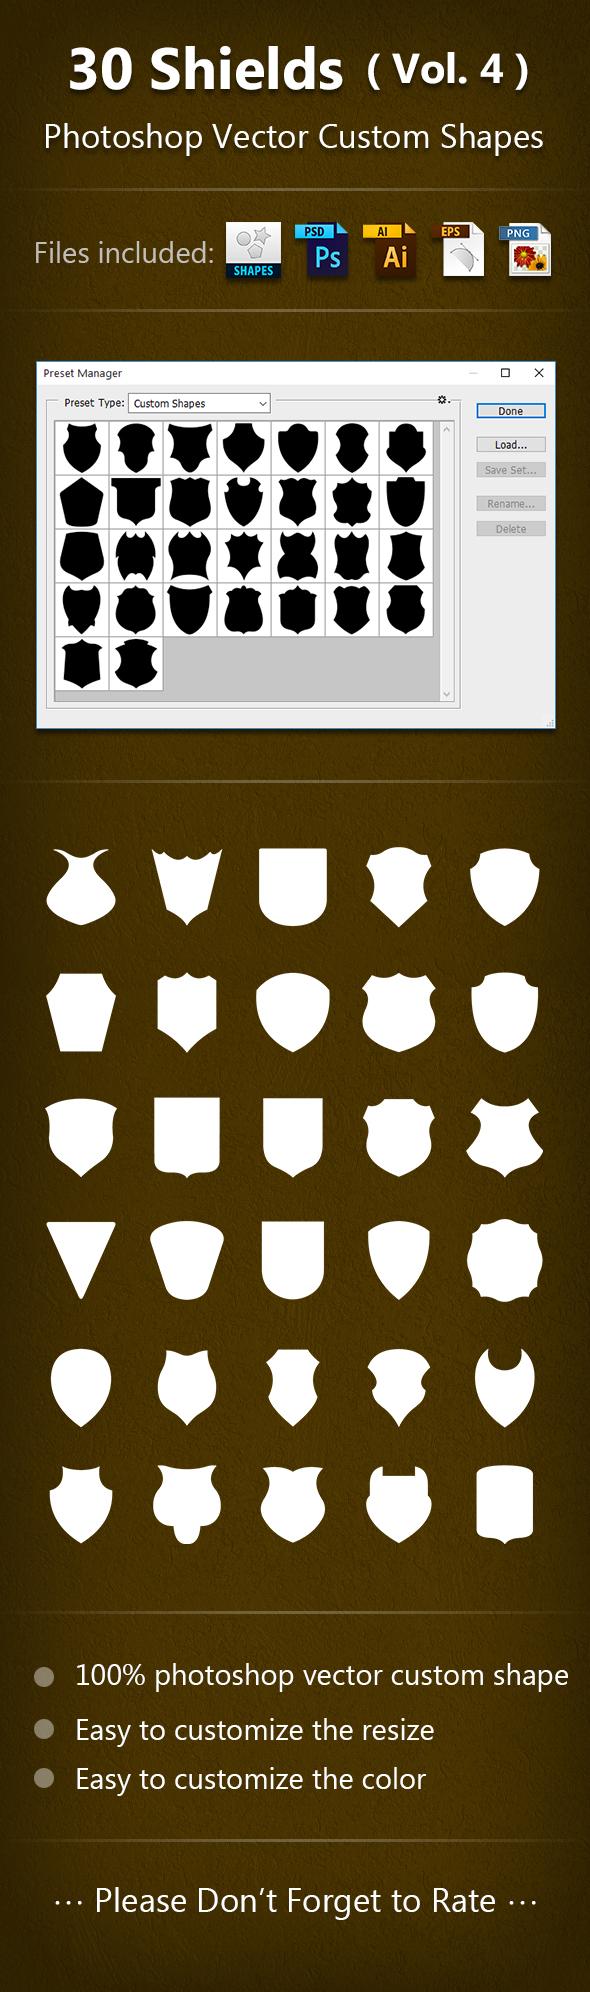 30 Shields Photoshop Vector Custom Shapes ( Vol.4 ) - Add-ons